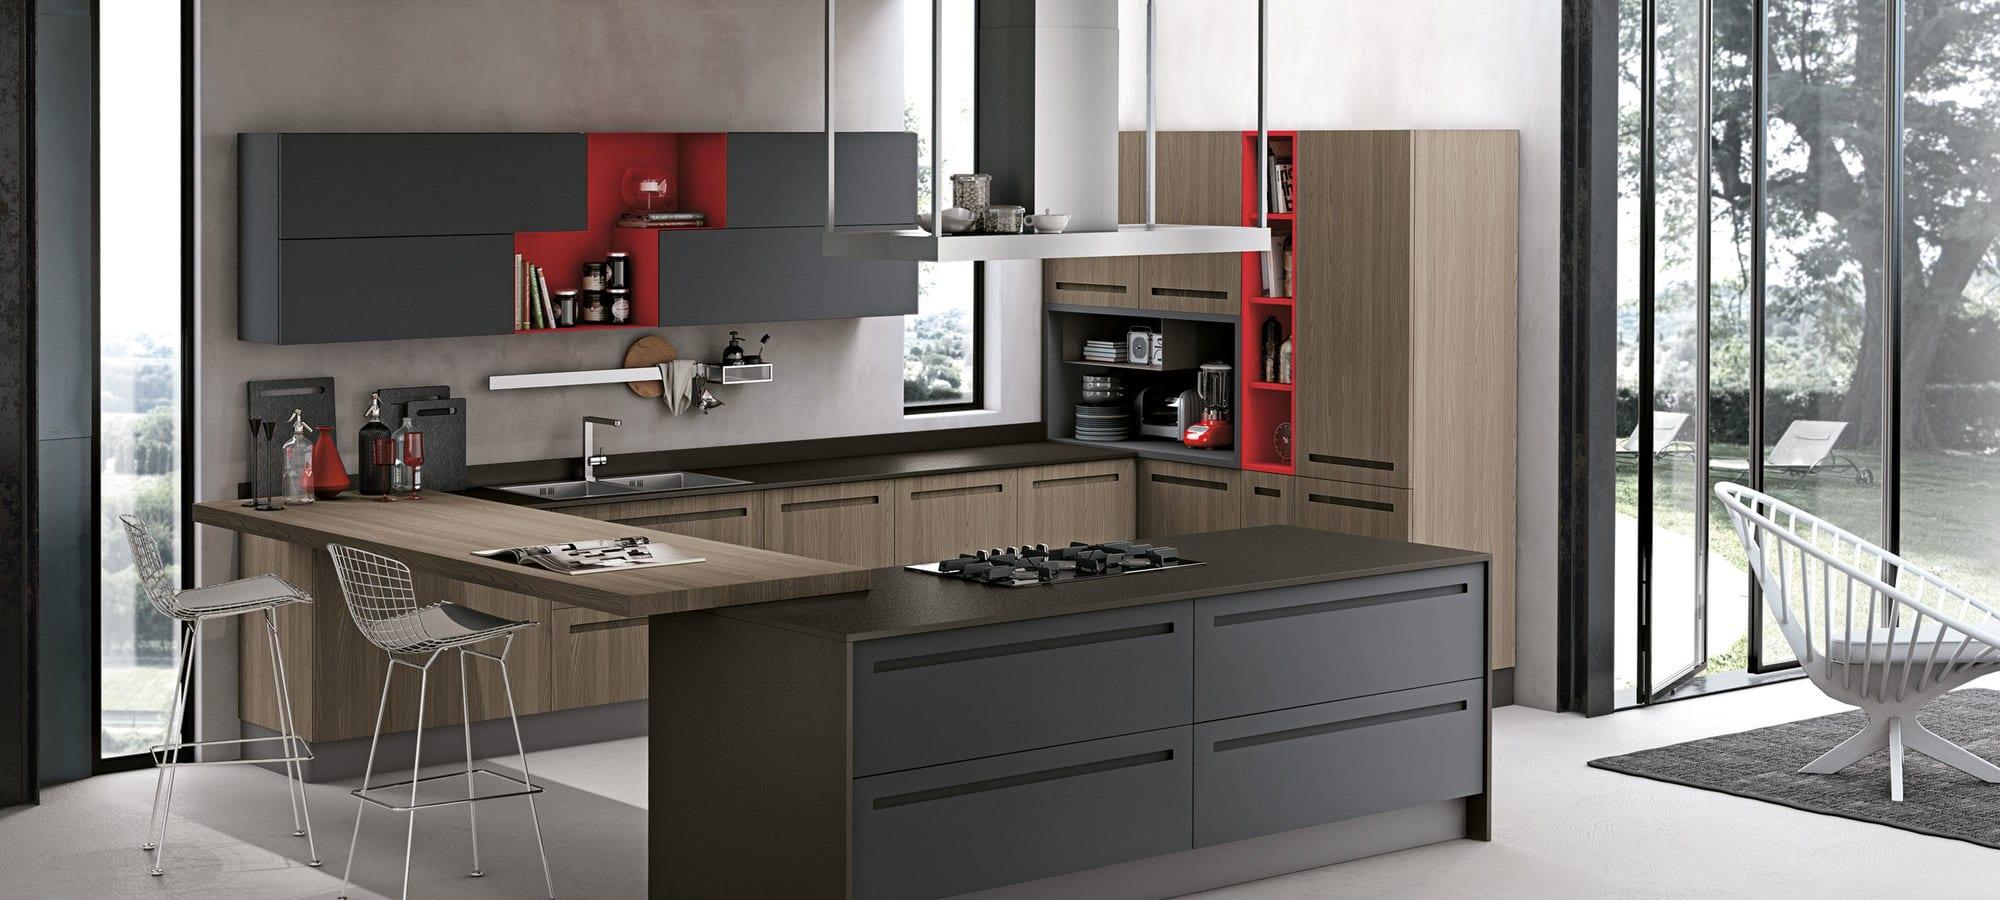 Cucine Stosa Showroom a Bologna | Raimondi Idee Casa